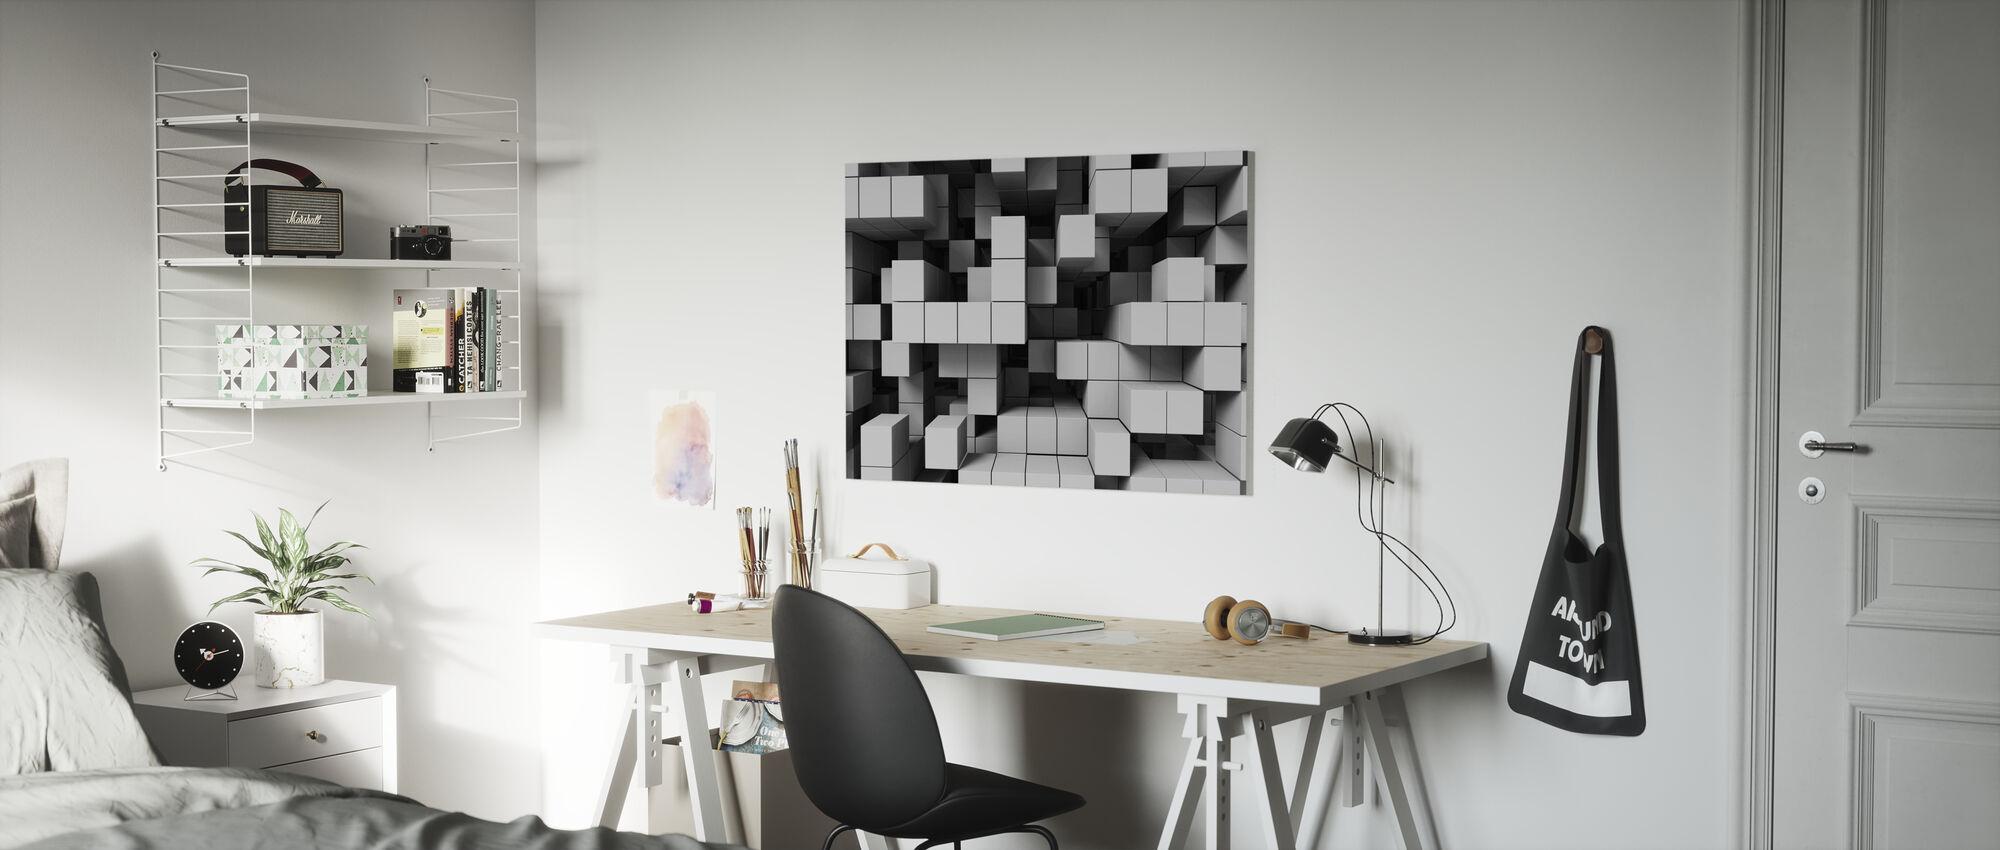 Deep Tetris - Hellgrau - Leinwandbild - Kinderzimmer